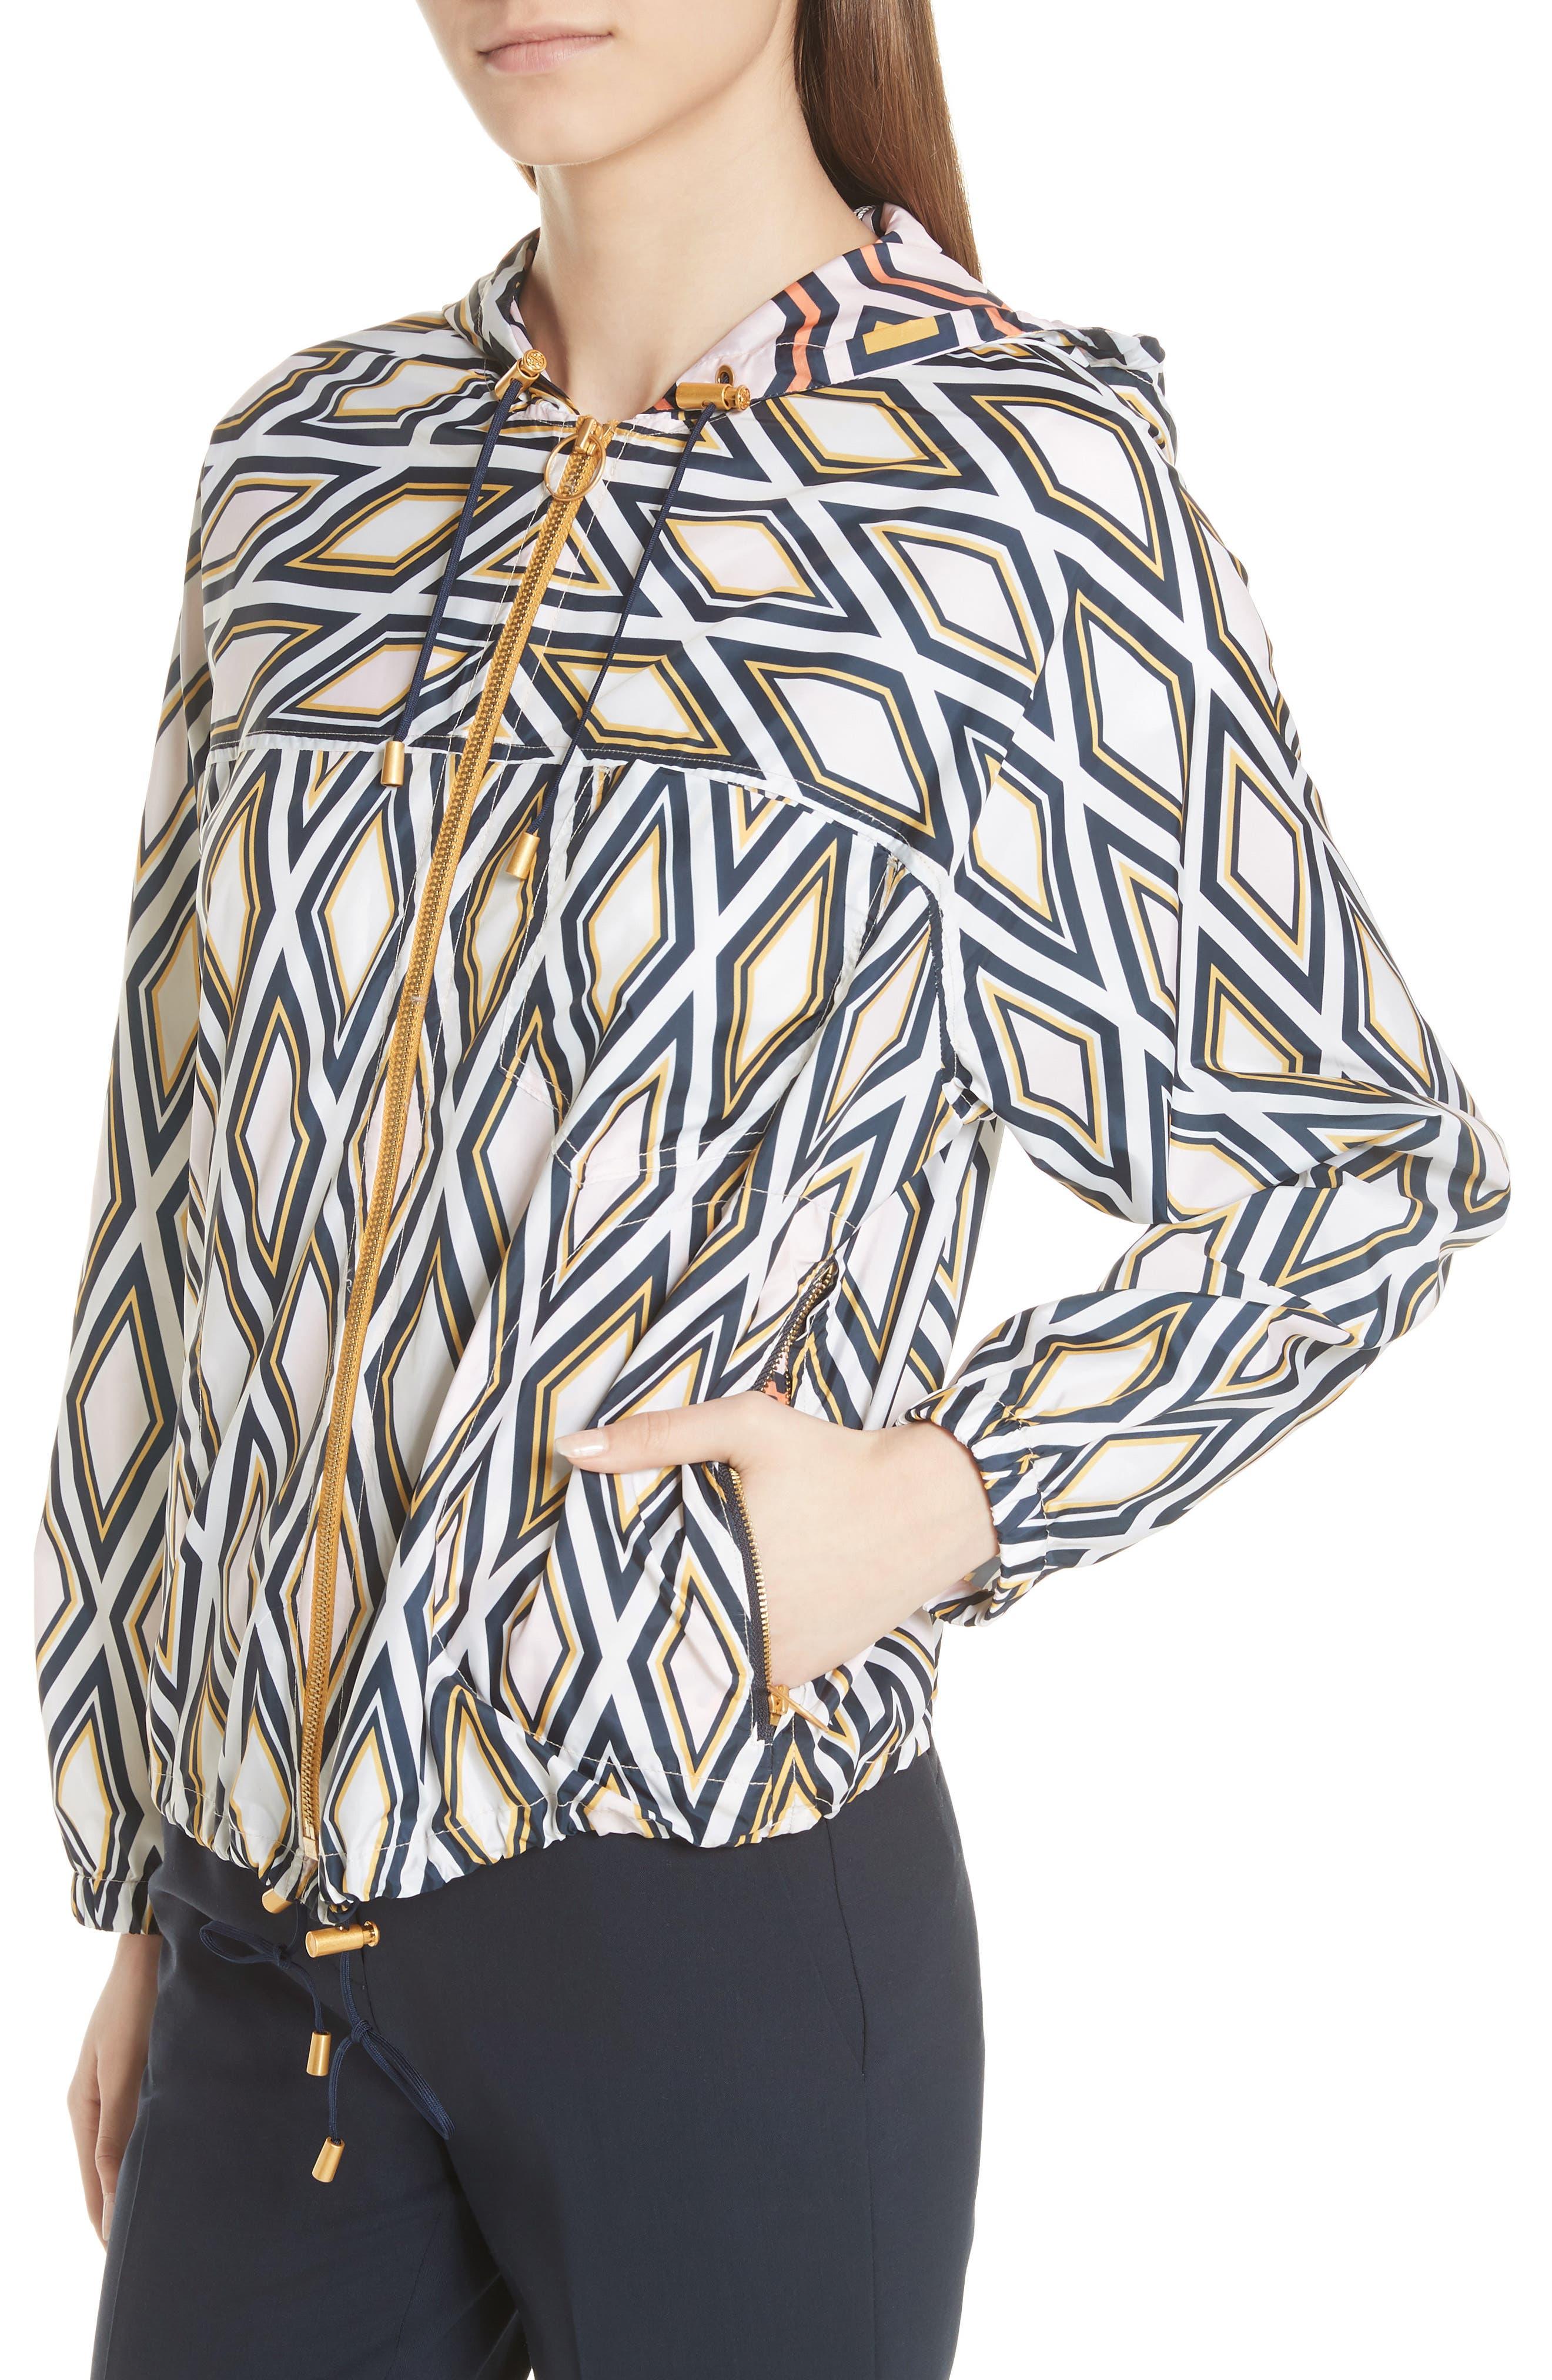 Devon Hooded Jacket,                             Alternate thumbnail 4, color,                             Solitaire Diamond